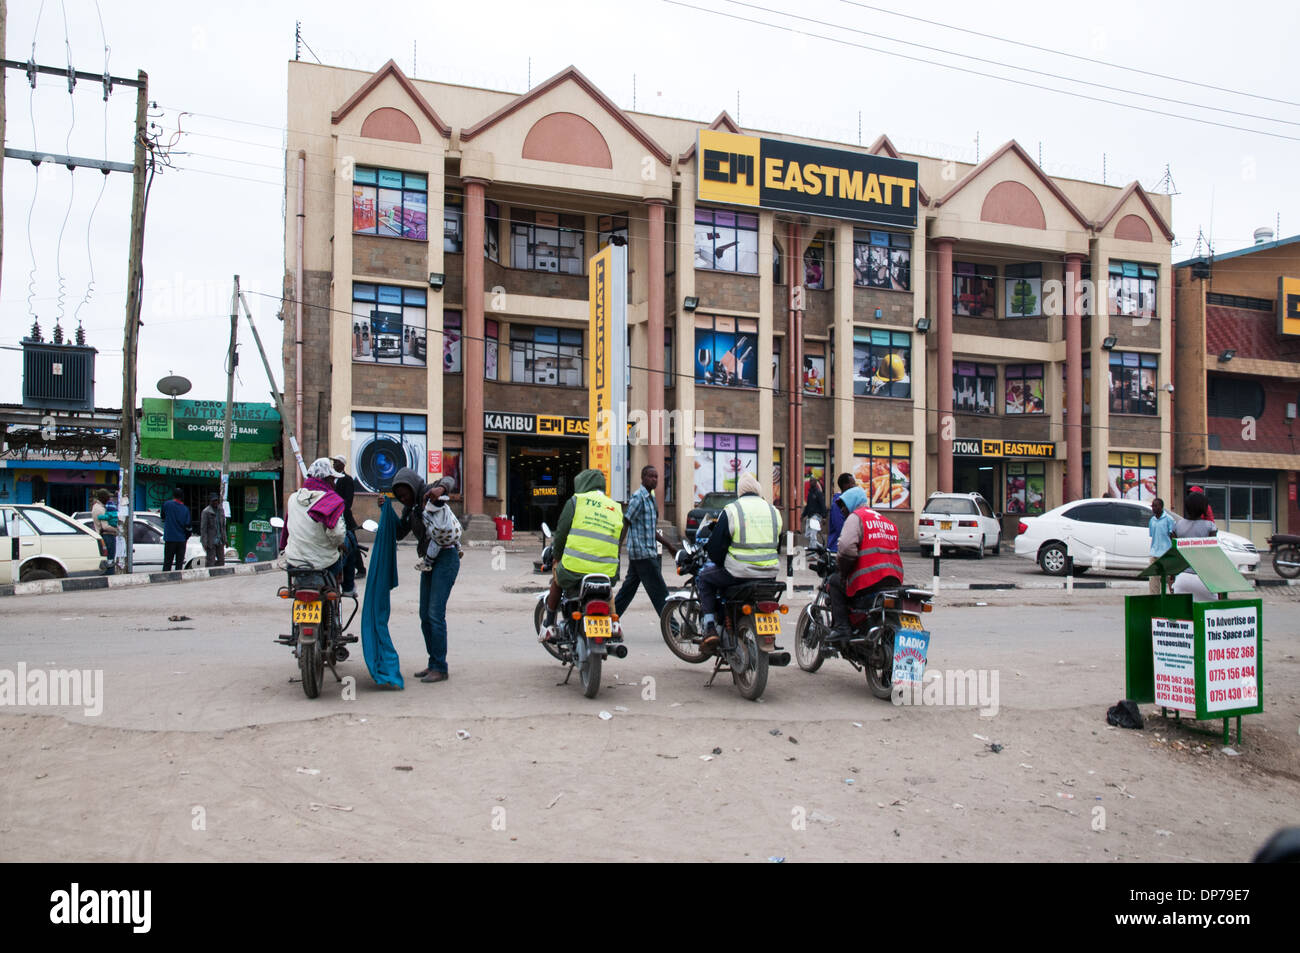 Motor cycle taxis await clients at Eastmatt supermarket on Nairobi Namanga Road Kaijado Kenya Africa - Stock Image